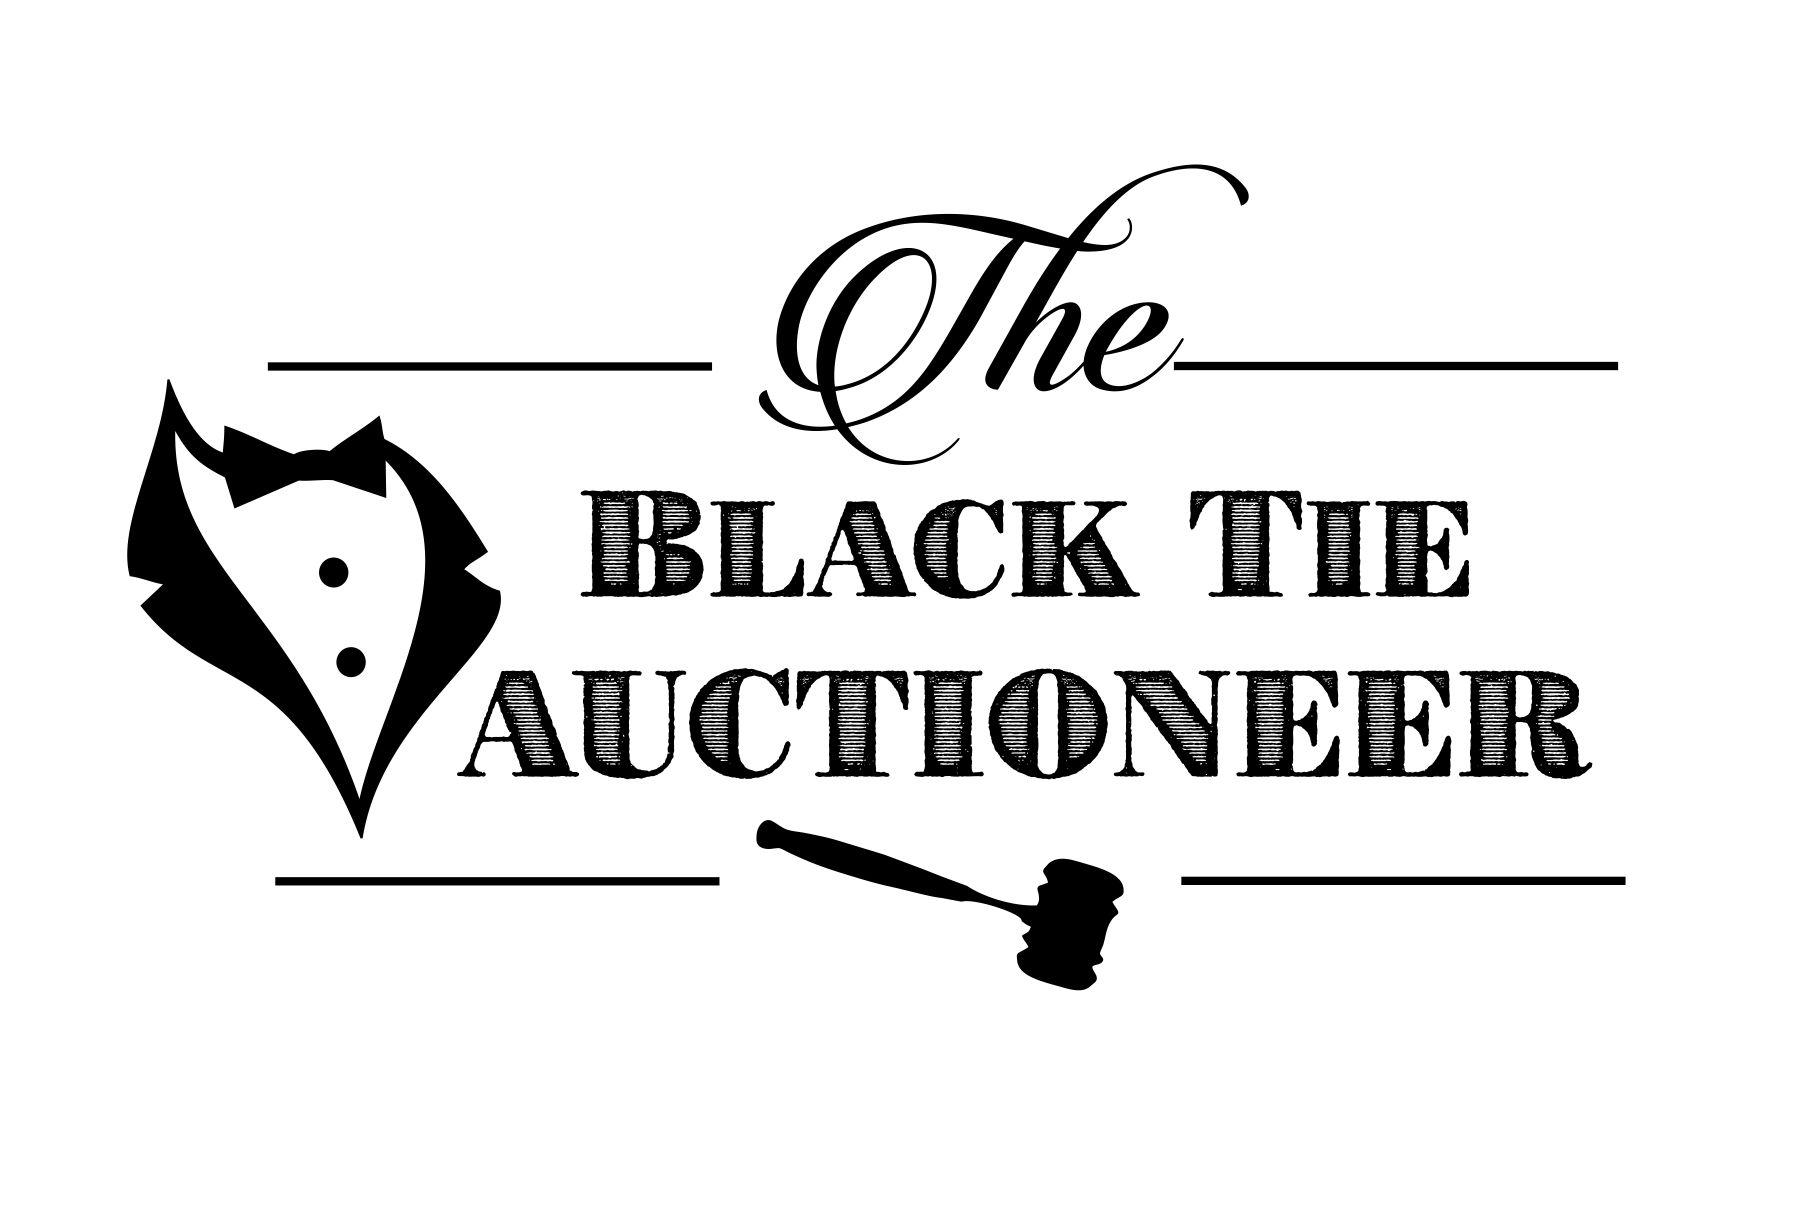 The Black Tie Auctioneer